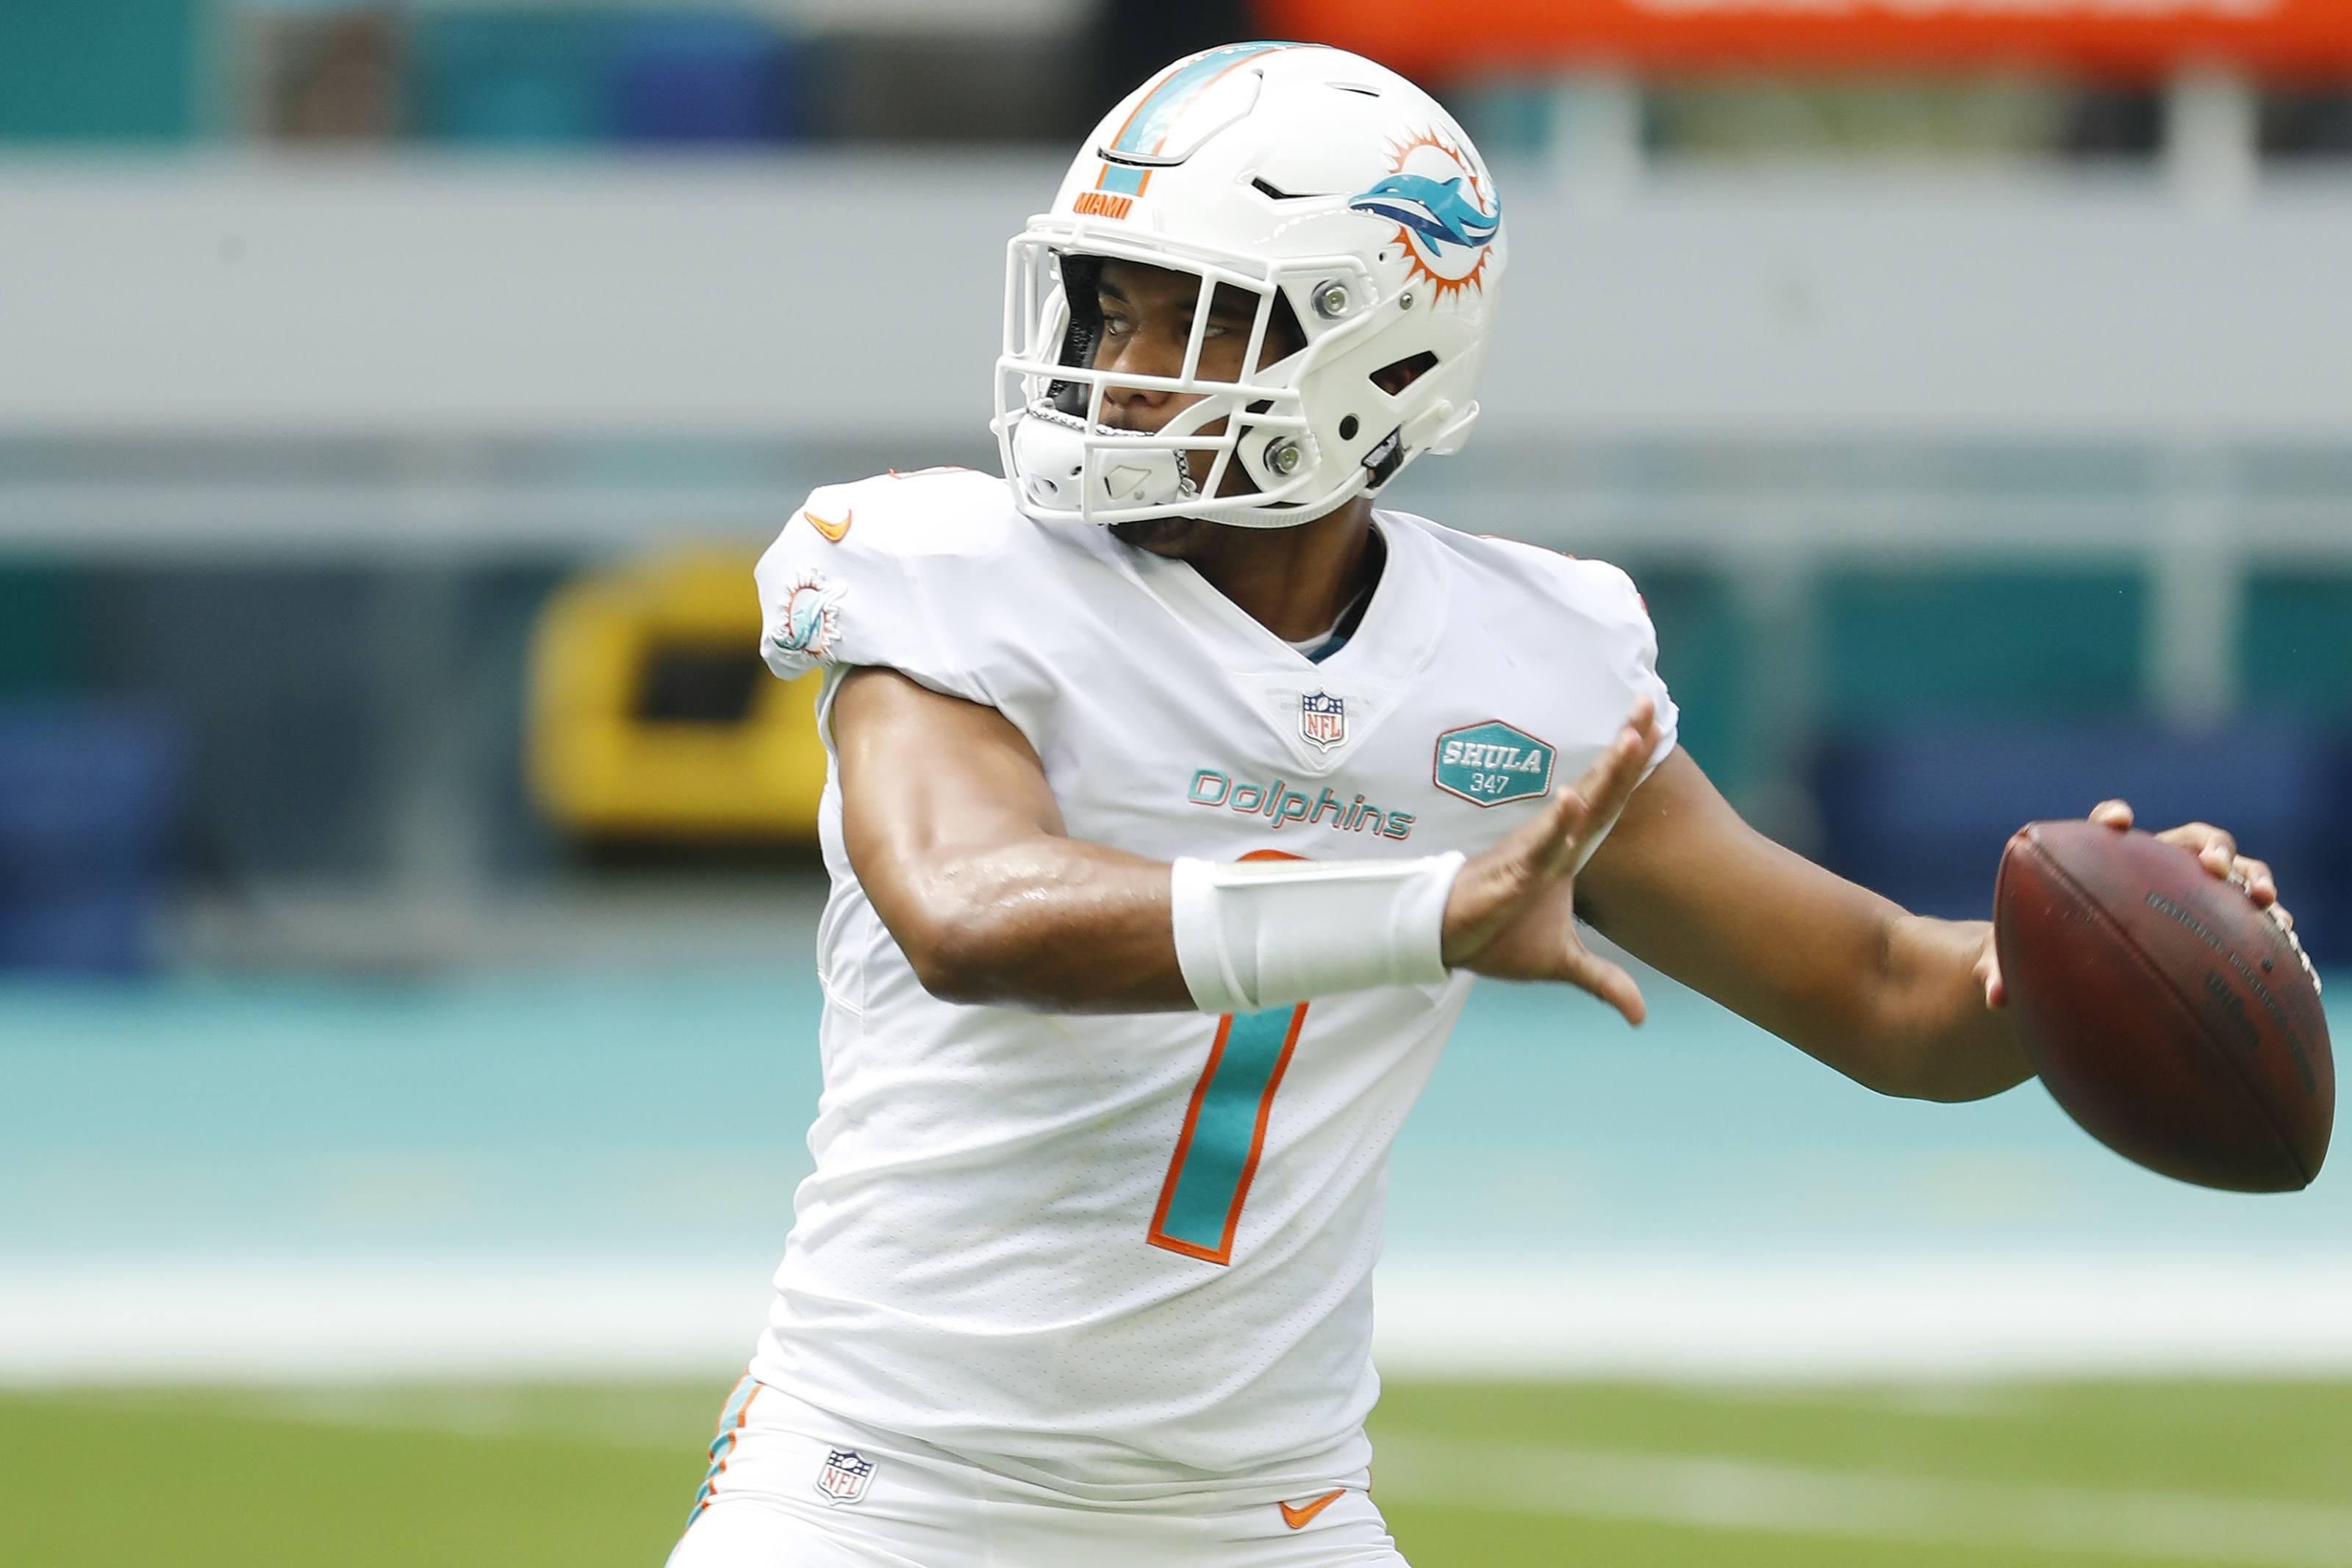 Tua Miami Dolphins Kansas City Chiefs NFL Week 14